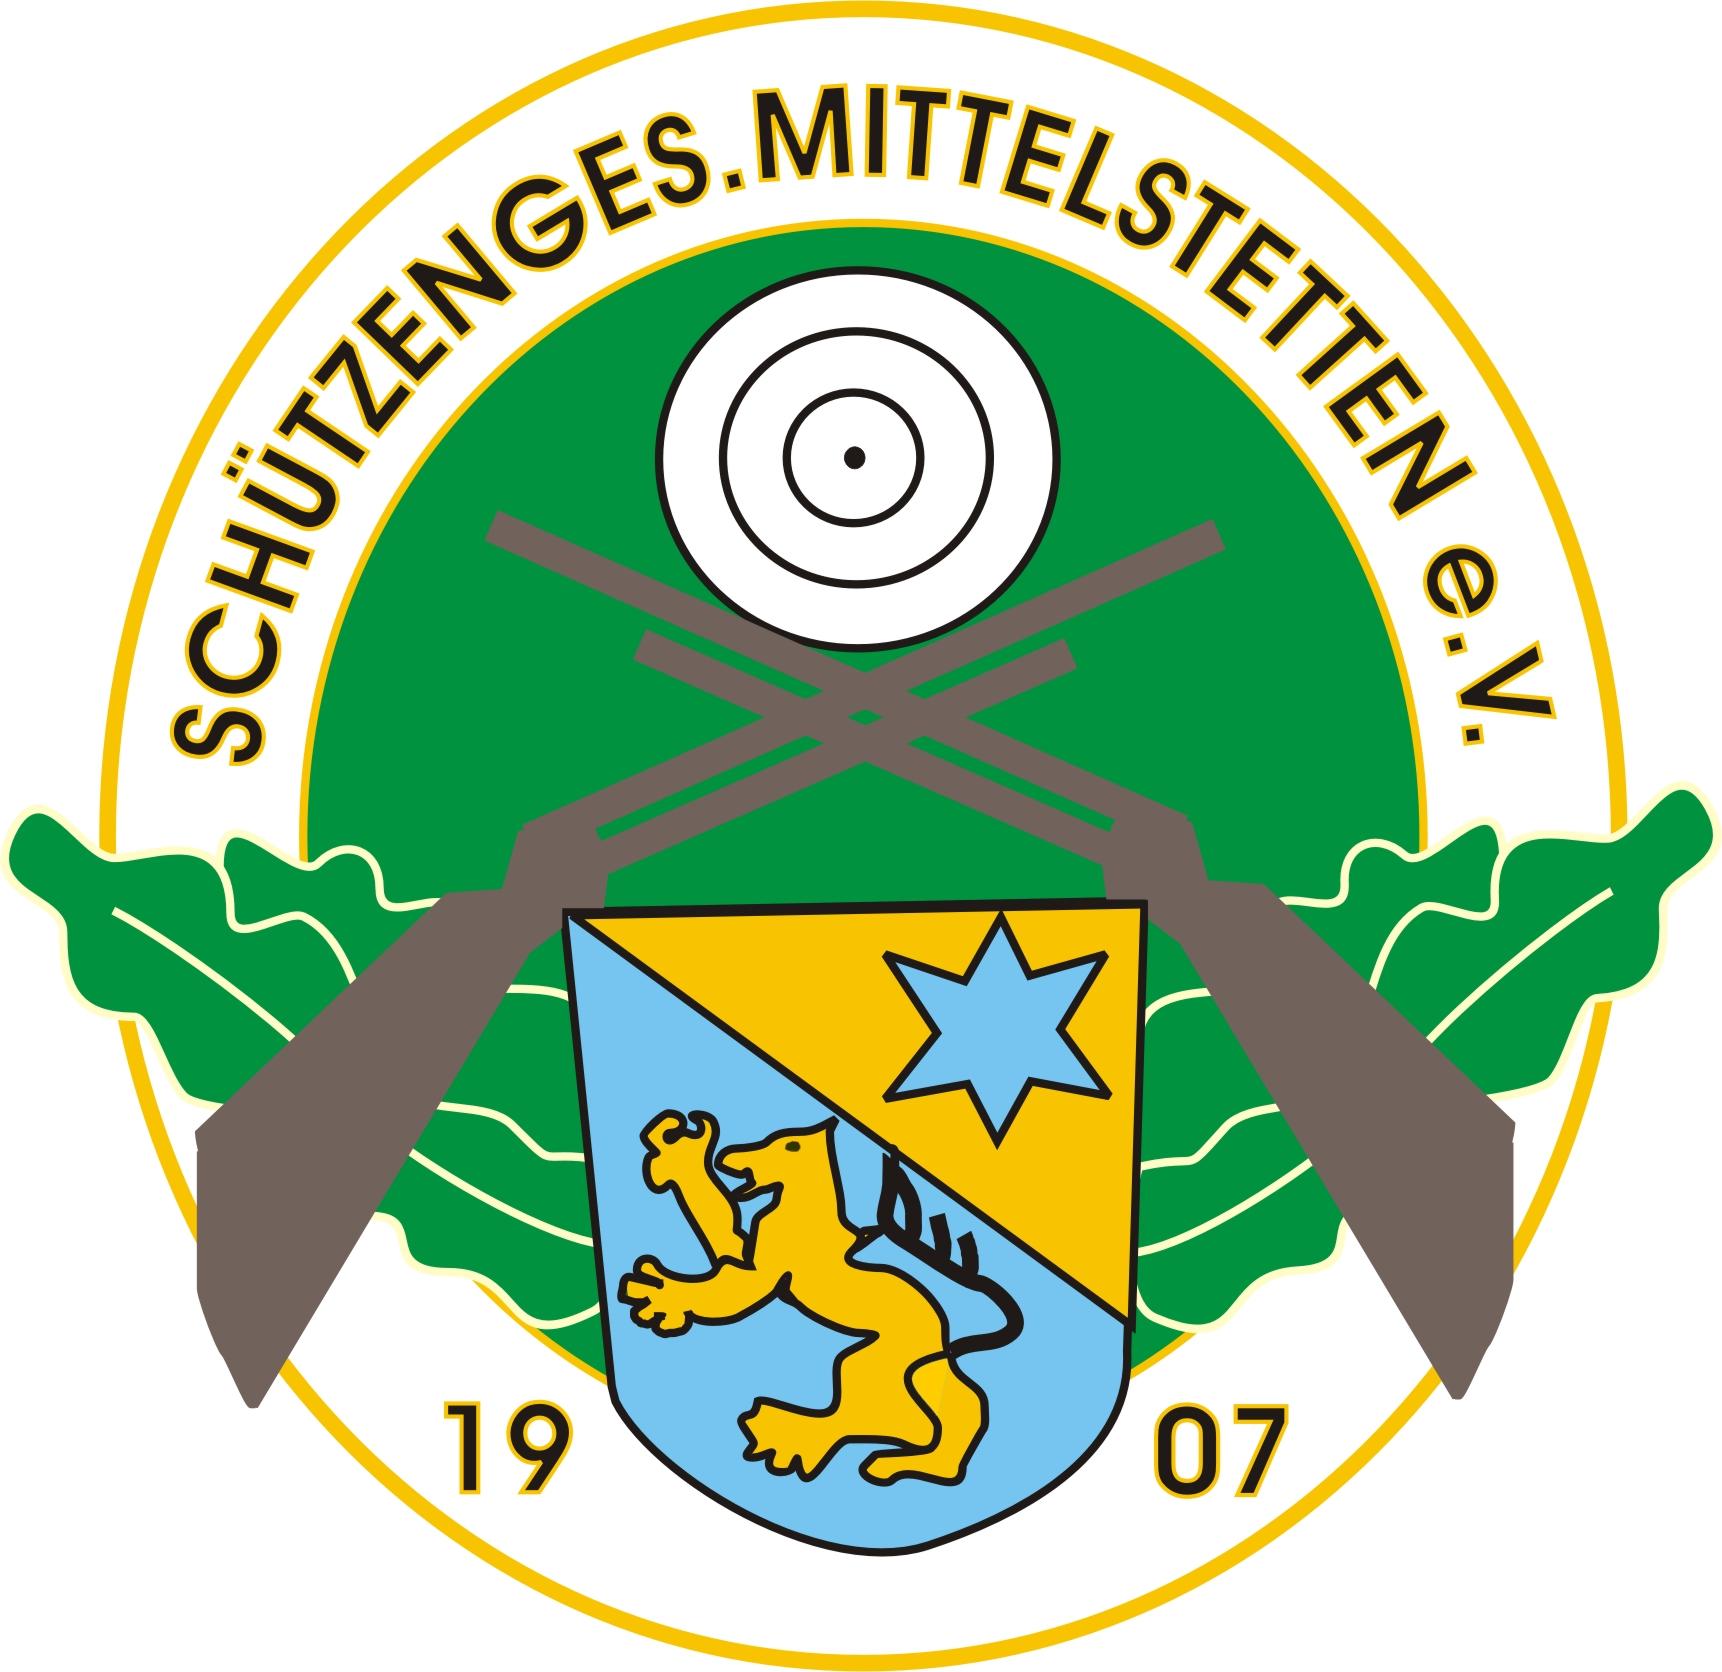 LP2 Mittelstetten